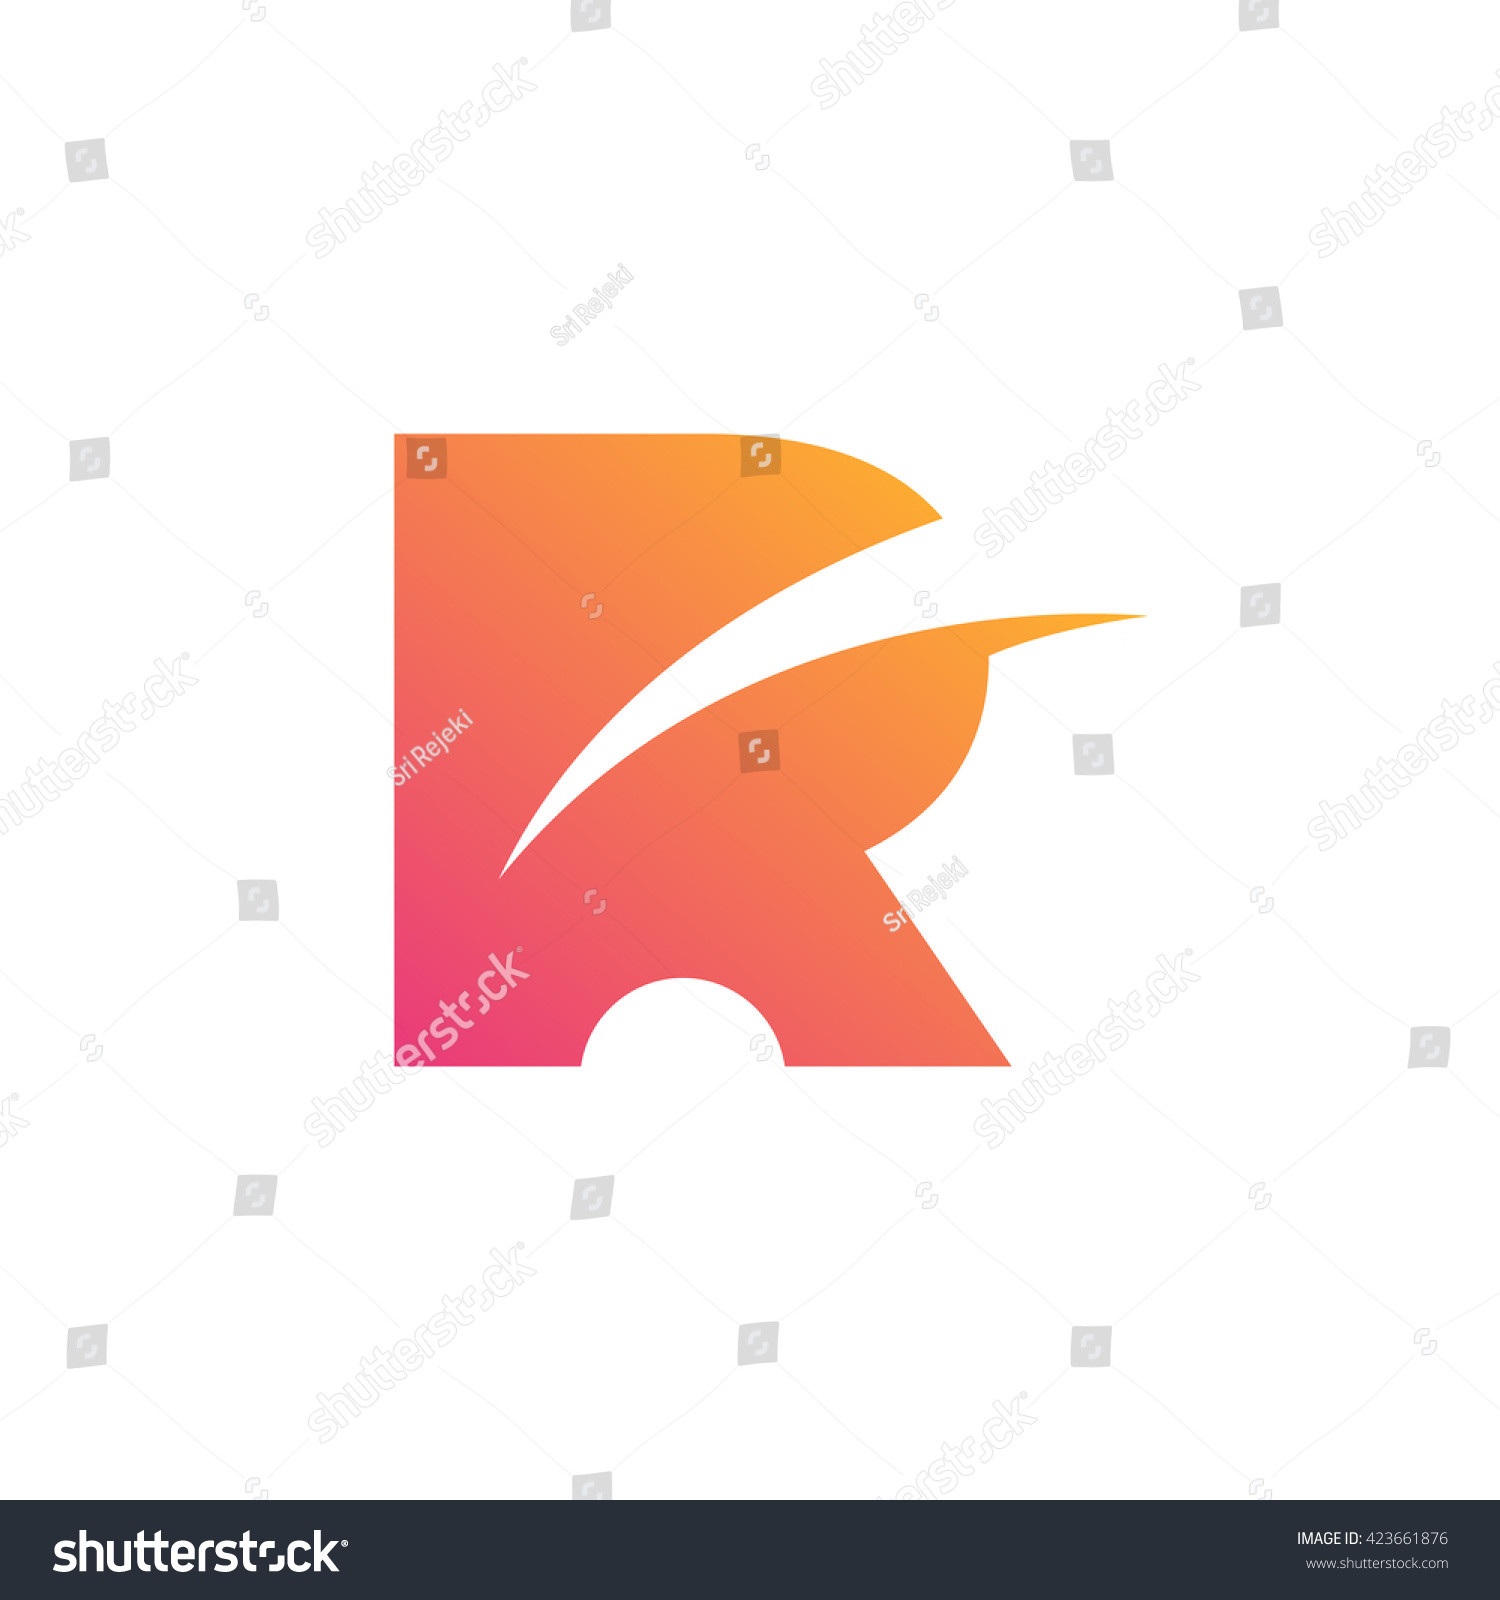 Stylish Letter R  Rectangle Icon  Creative Design. Stylish Letter R Rectangle Icon Creative Stock Vector 423661876